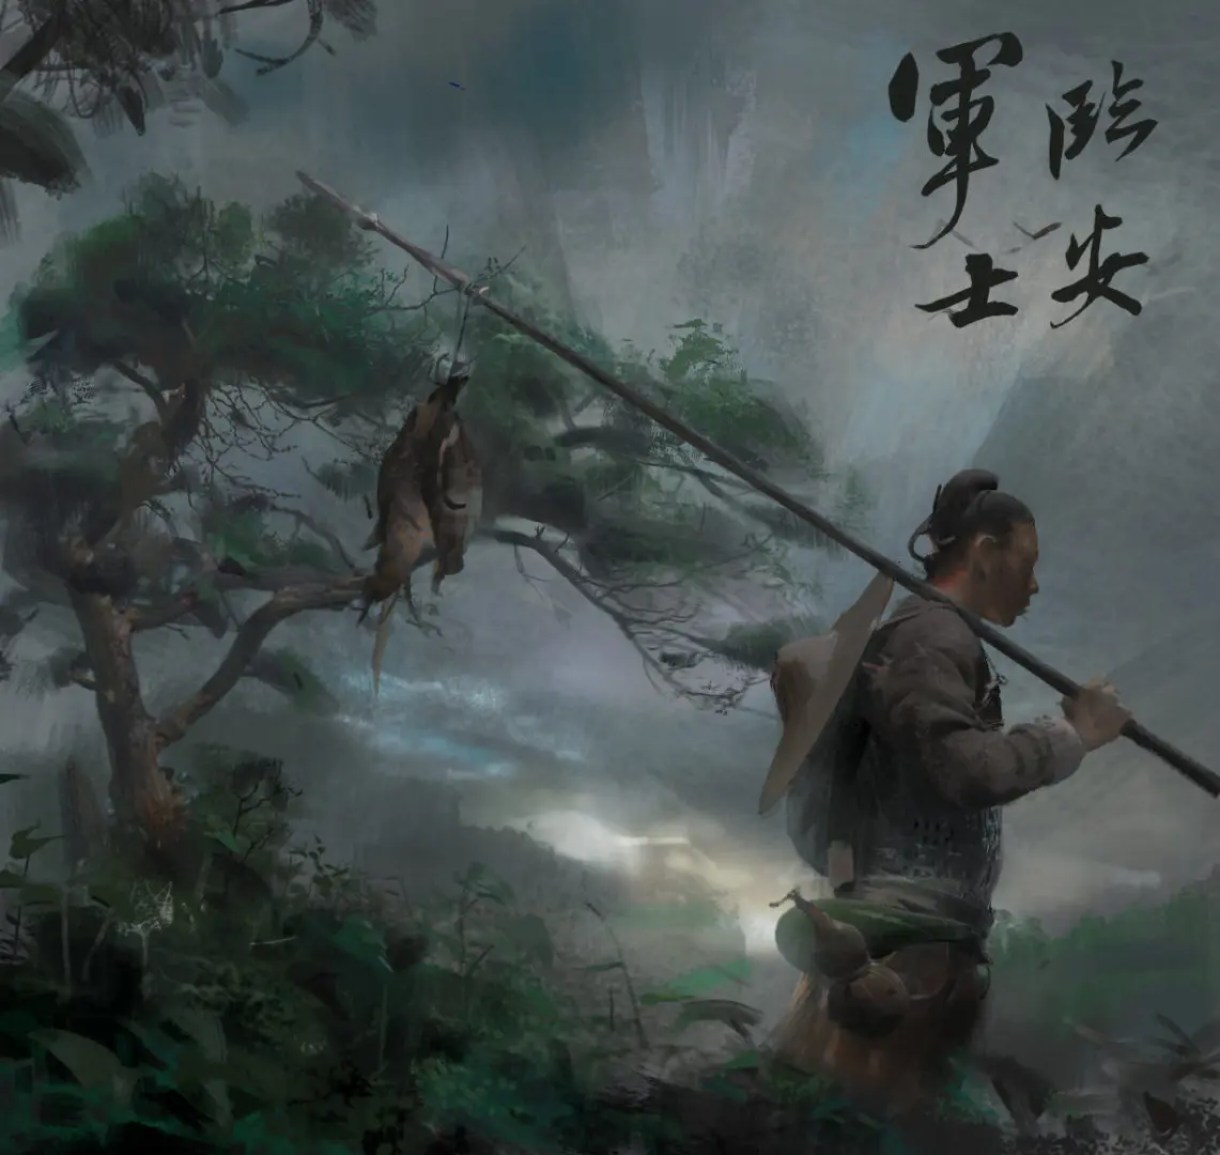 shuai zhang illustration concept art